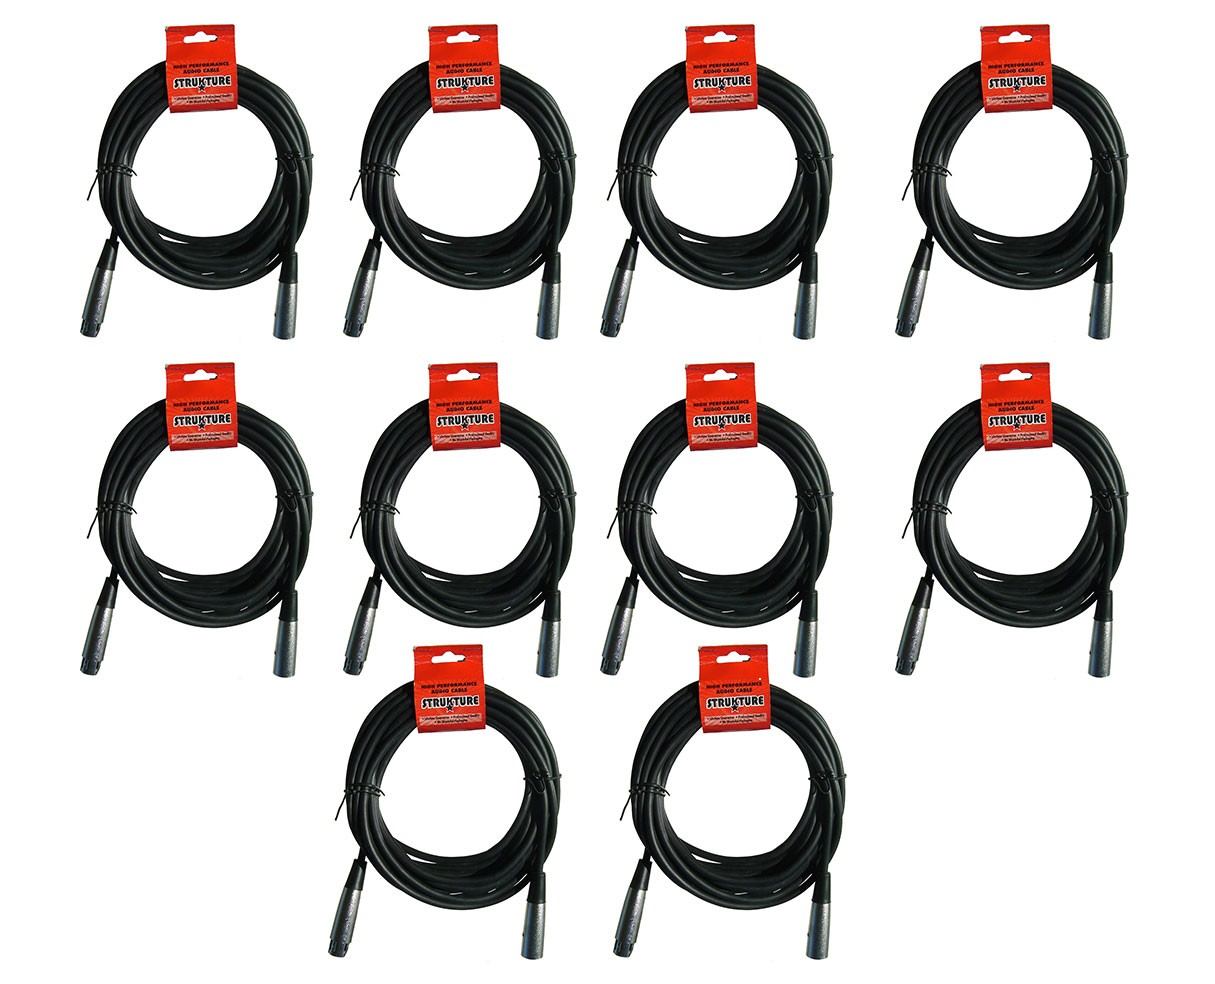 Strukture SMC20 20ft XLR Mic Cable (10-Pack)